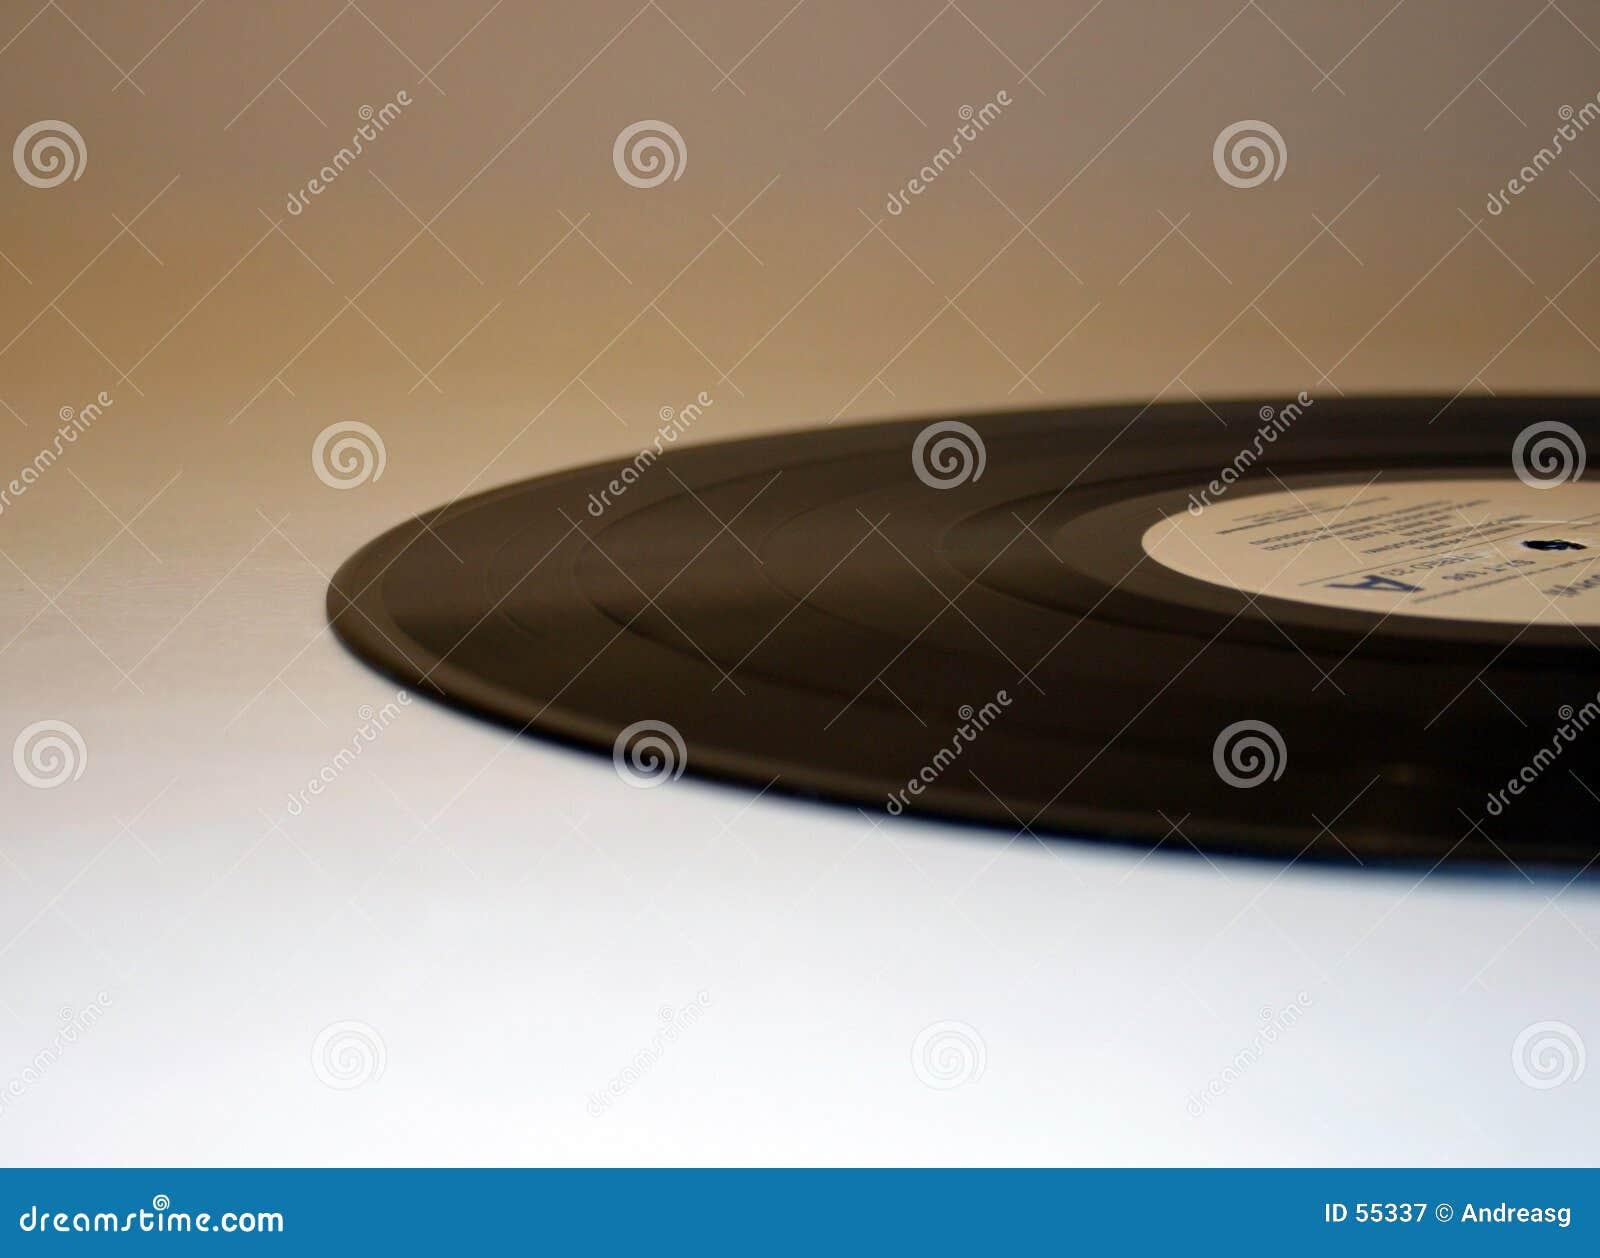 Vinyl ellipse